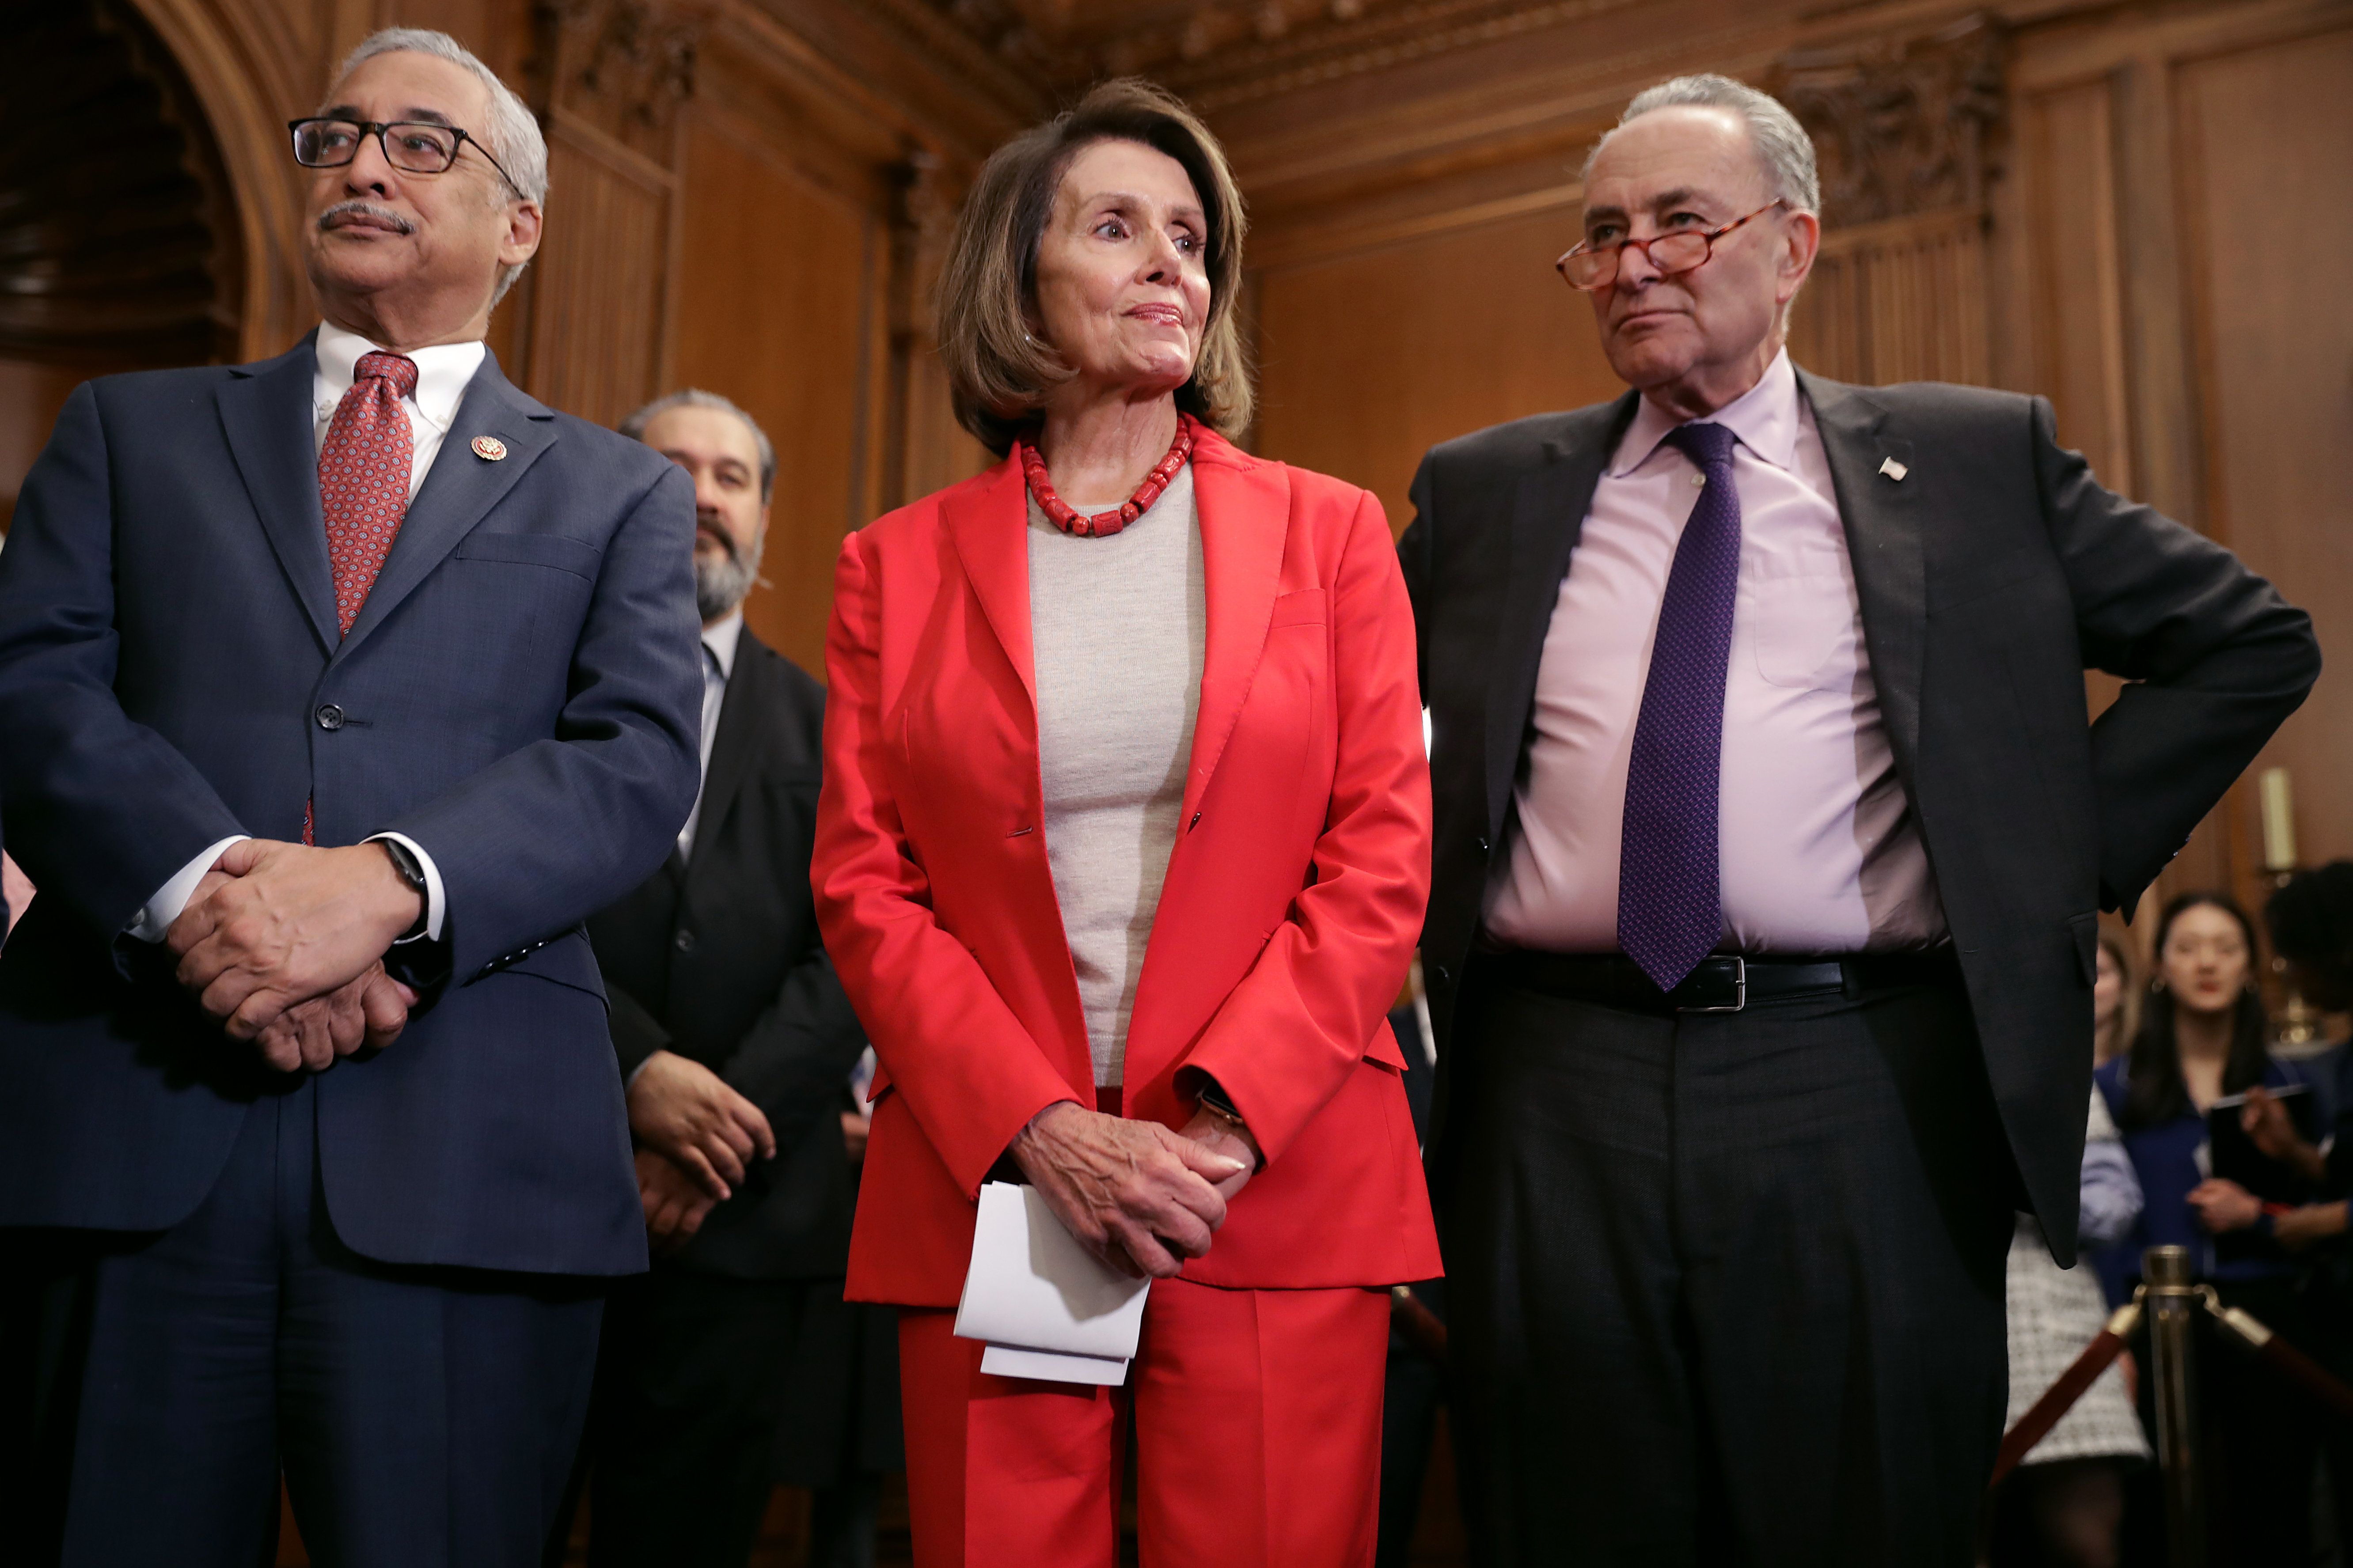 House Democrats Propose 15 Minimum Wage With New Majority